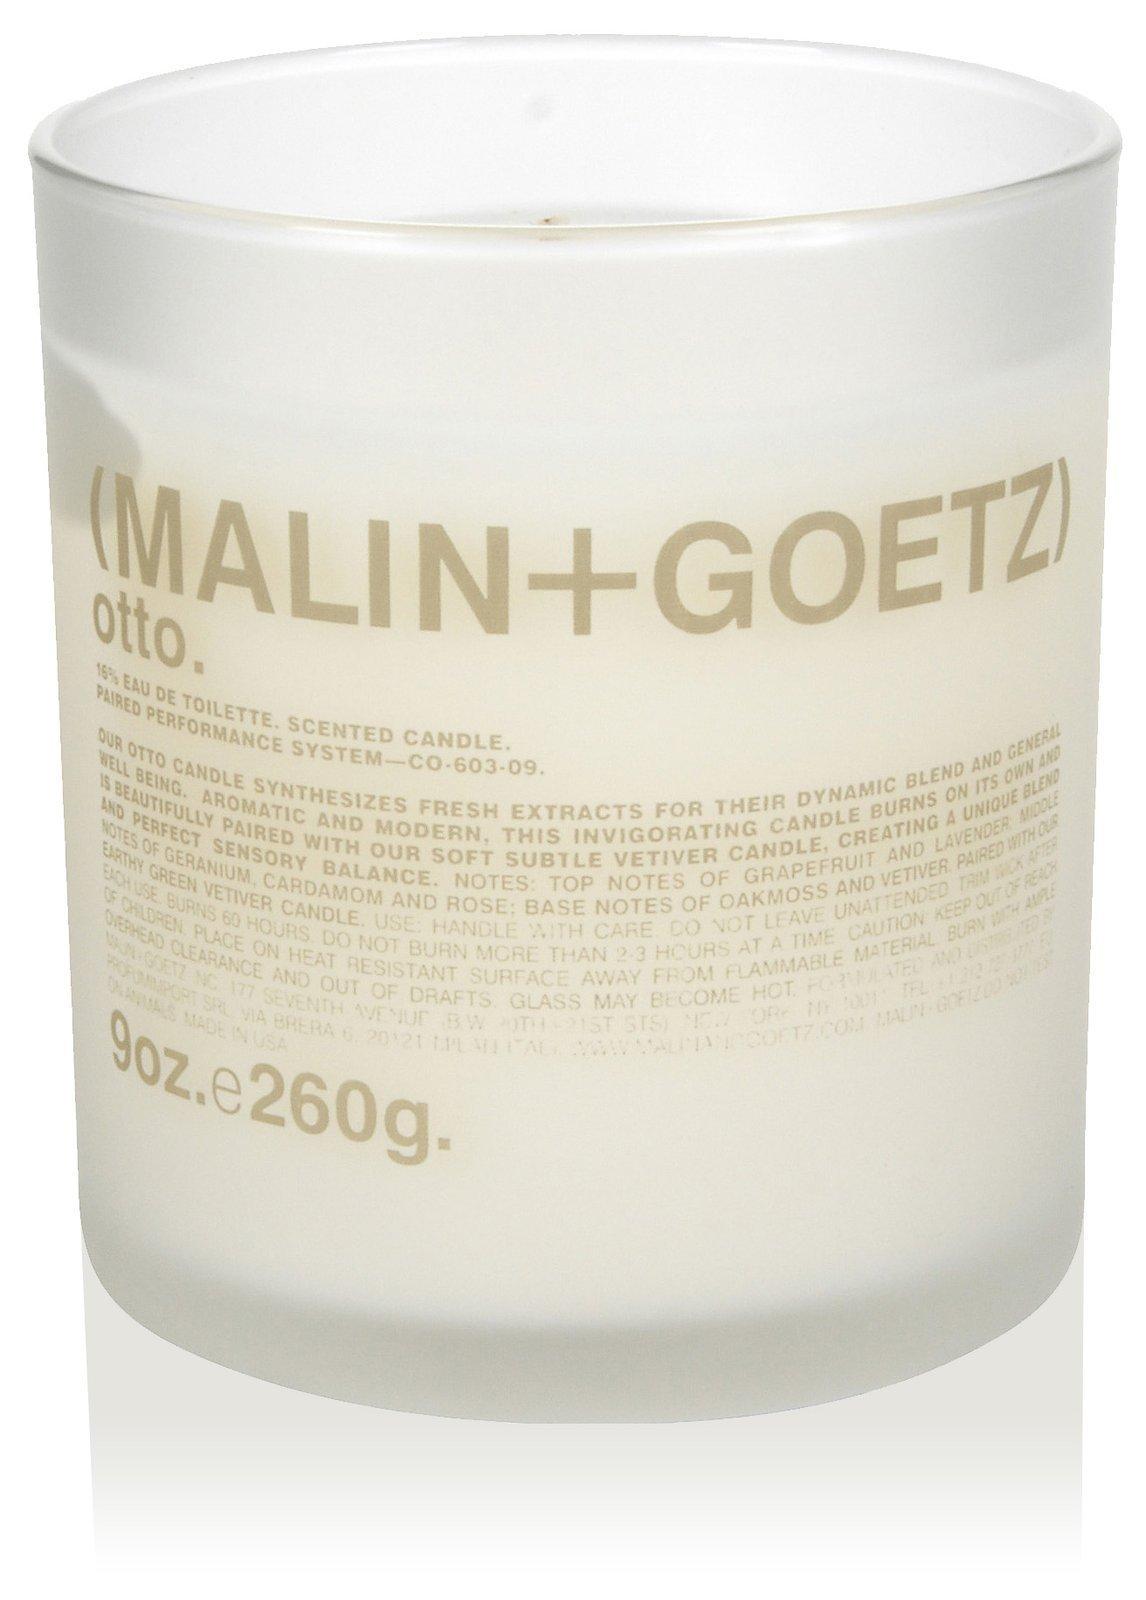 Malin + Goetz Candle, Otto, 9 Ounce